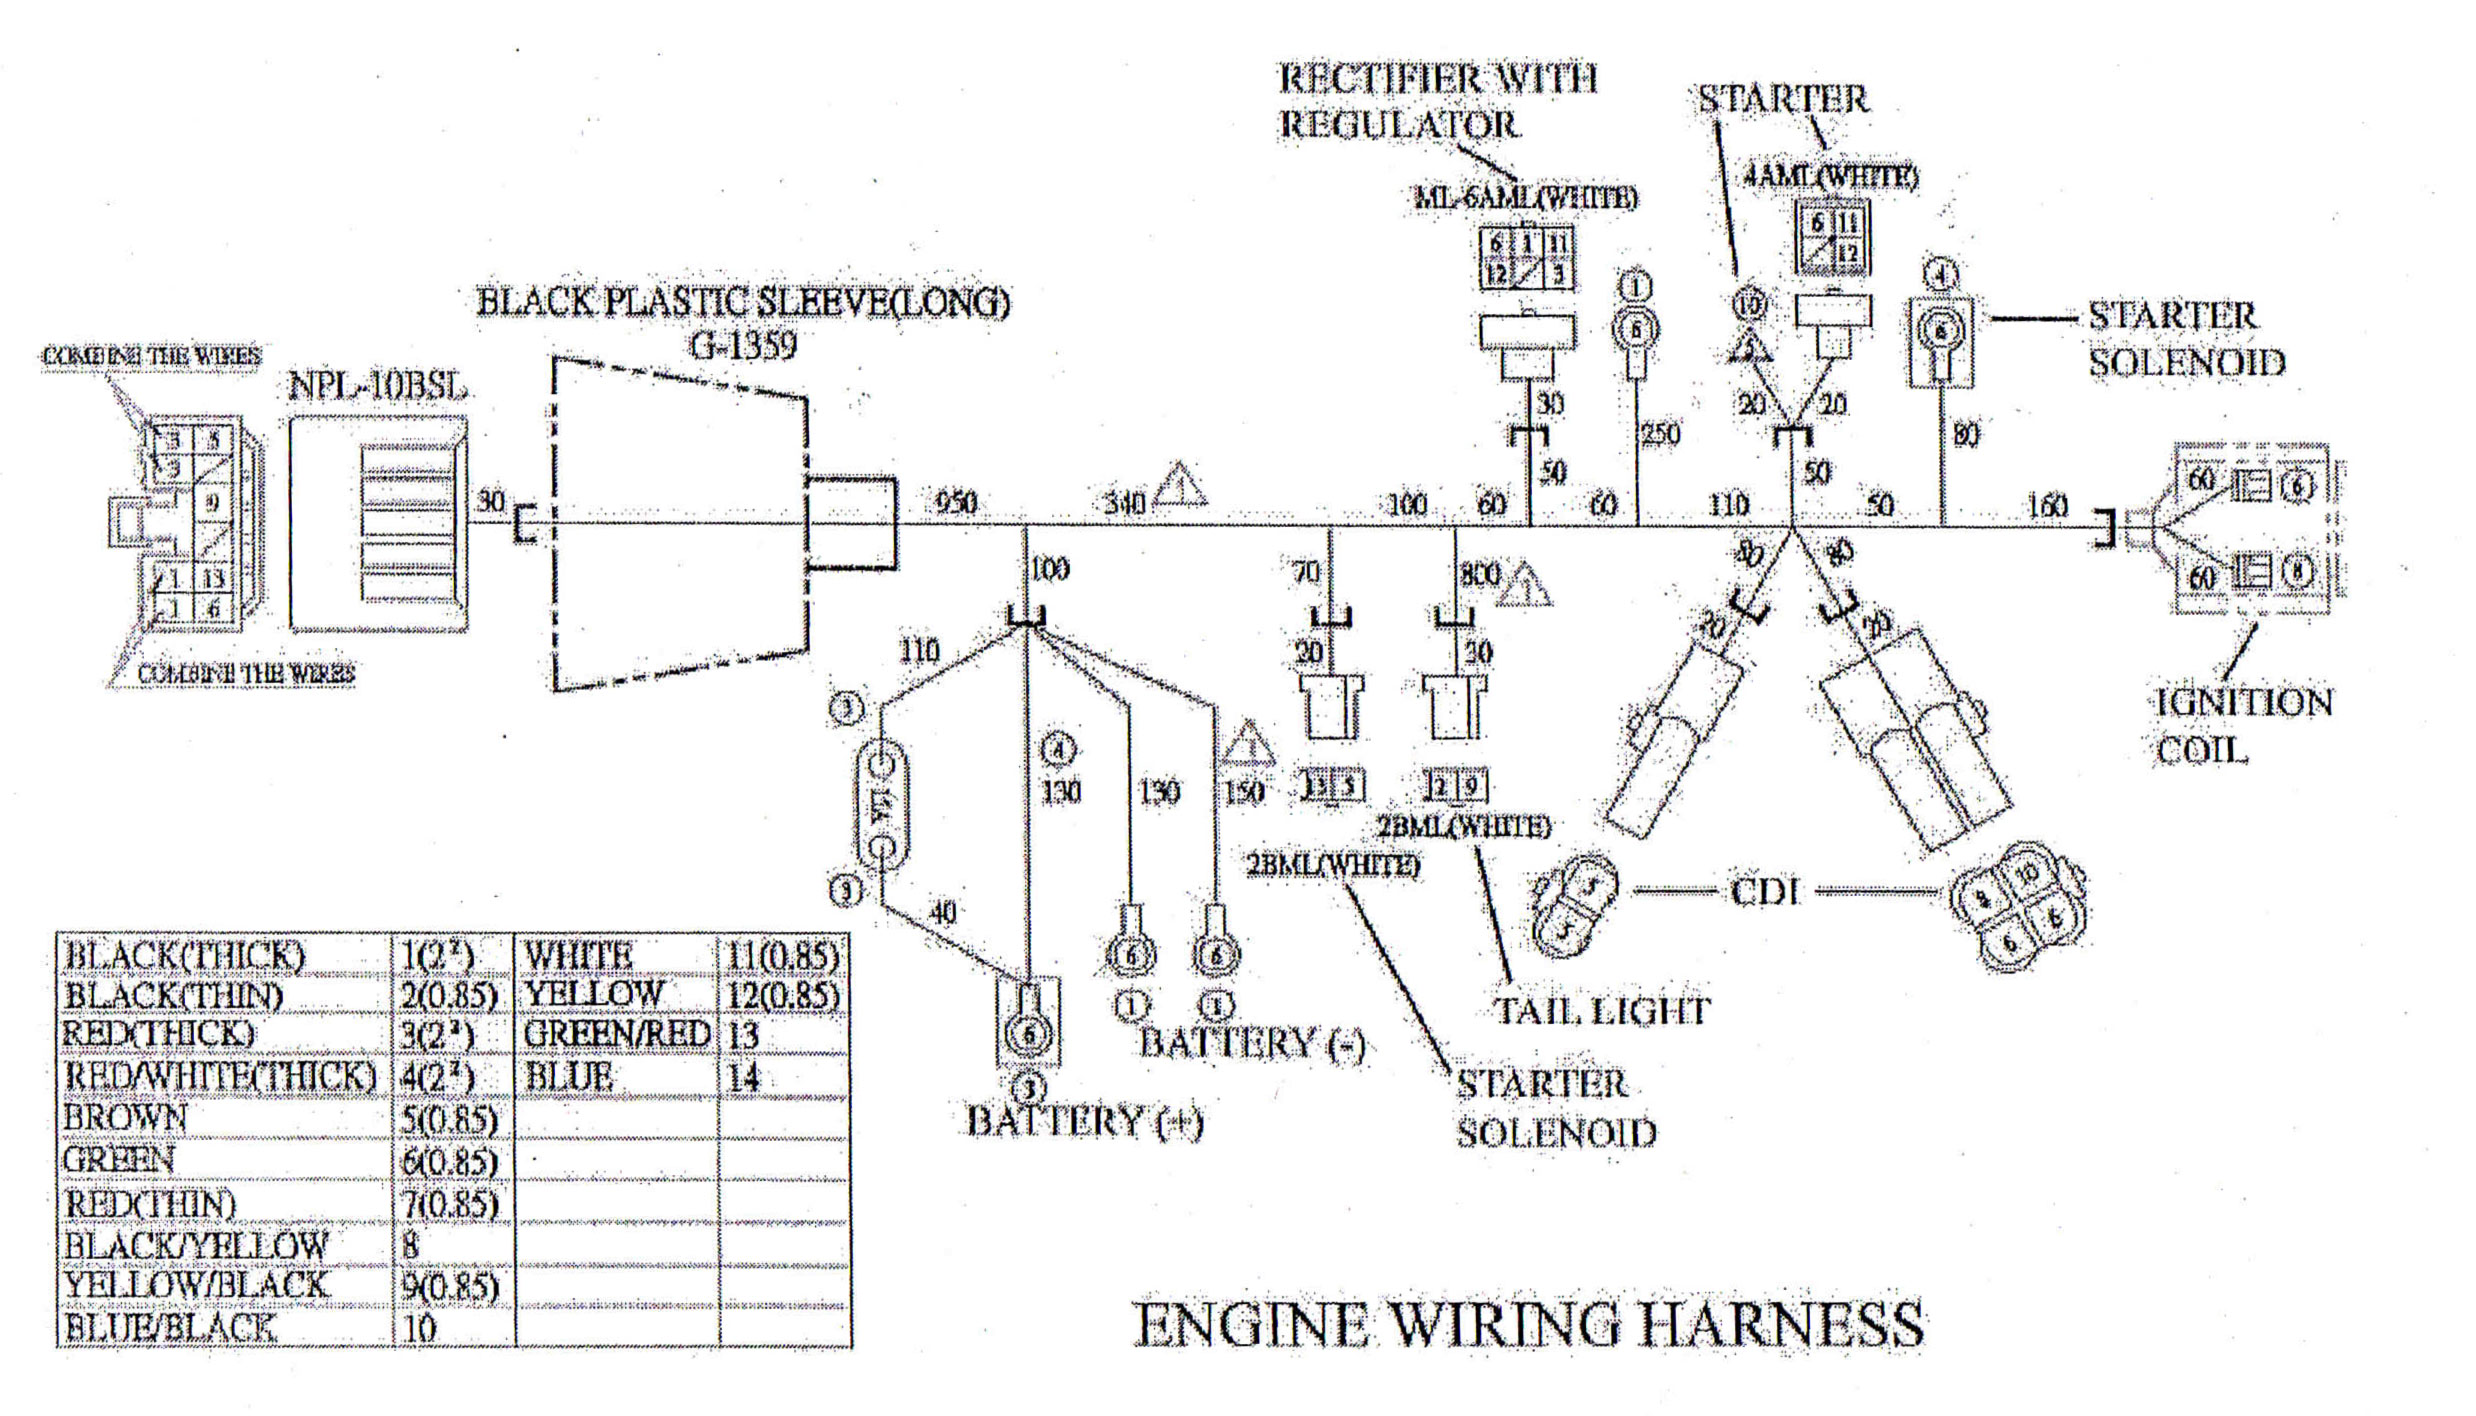 honda gx620 wiring schematic t5c honda gx620 wiring diagram honda cb125 wiring diagram